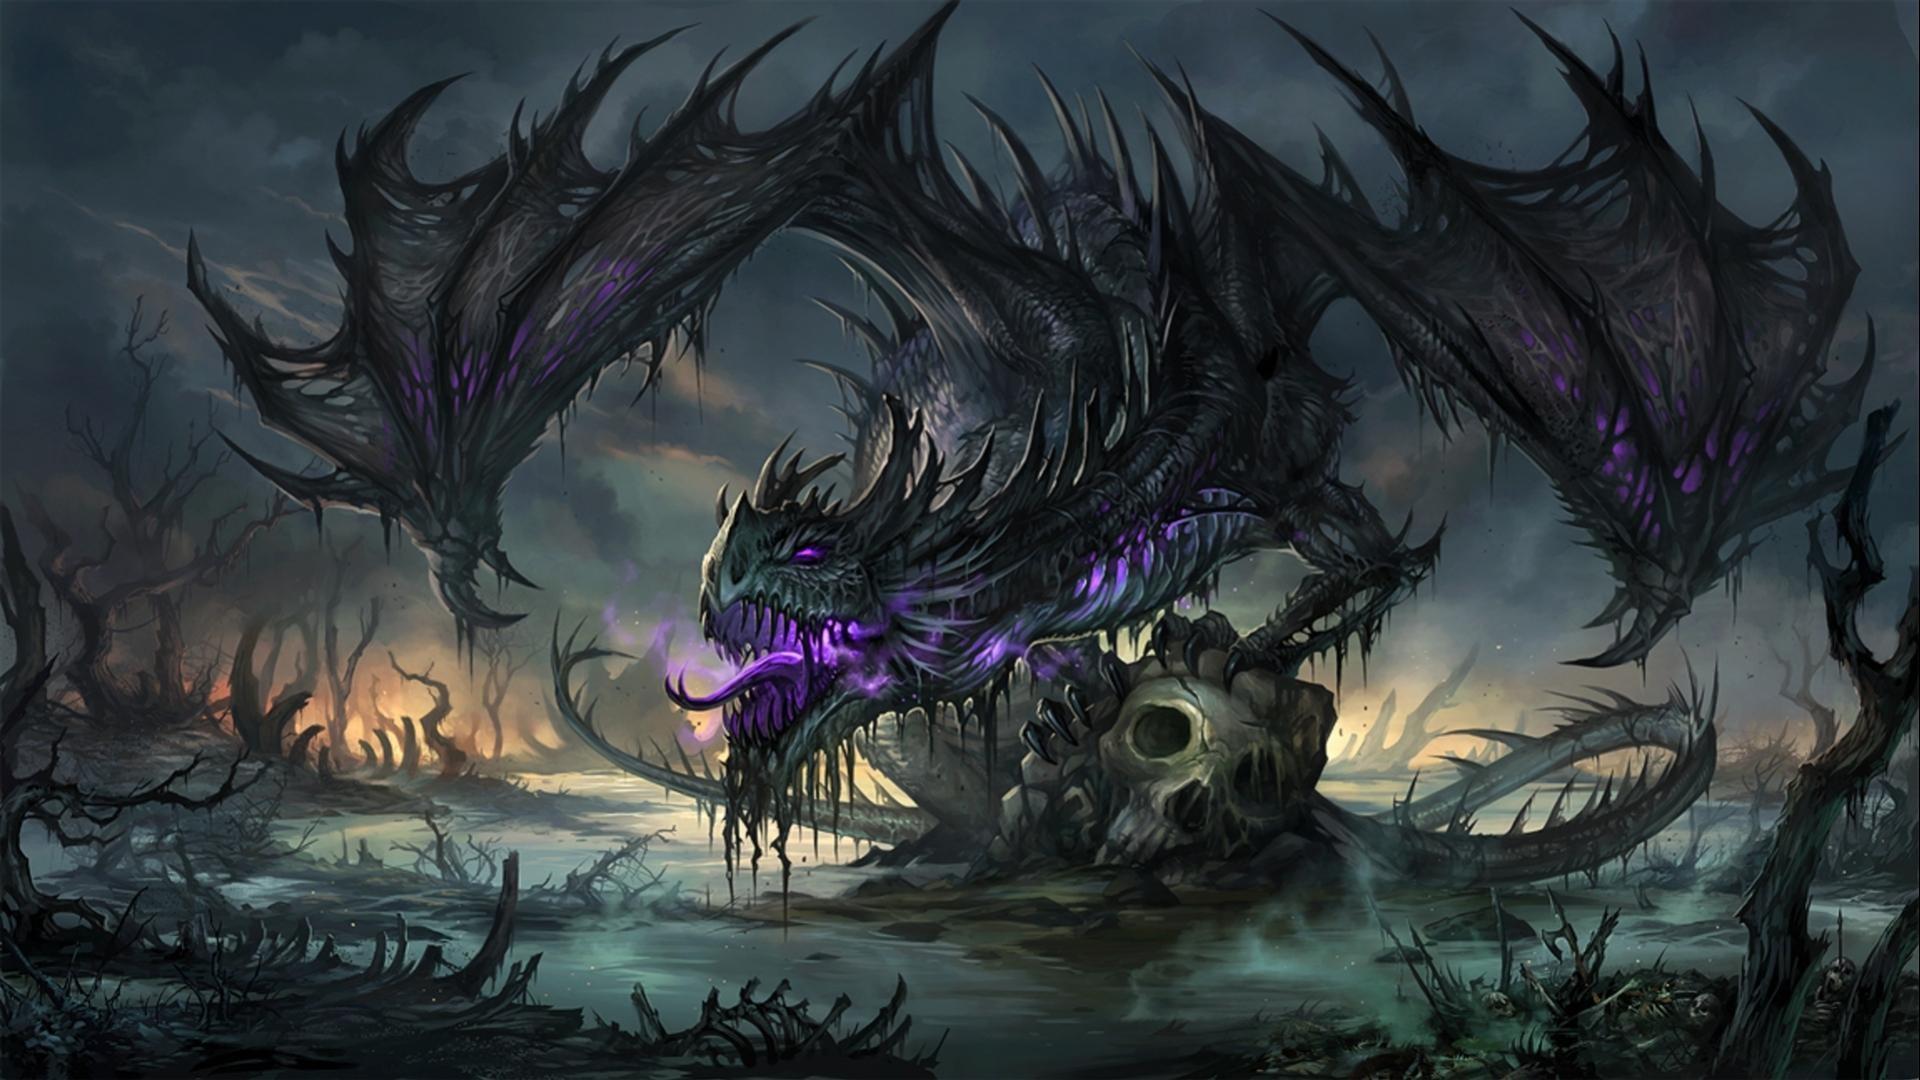 1920x1080 Badass Dragon Wallpapers High Resolution Download 2560x1600